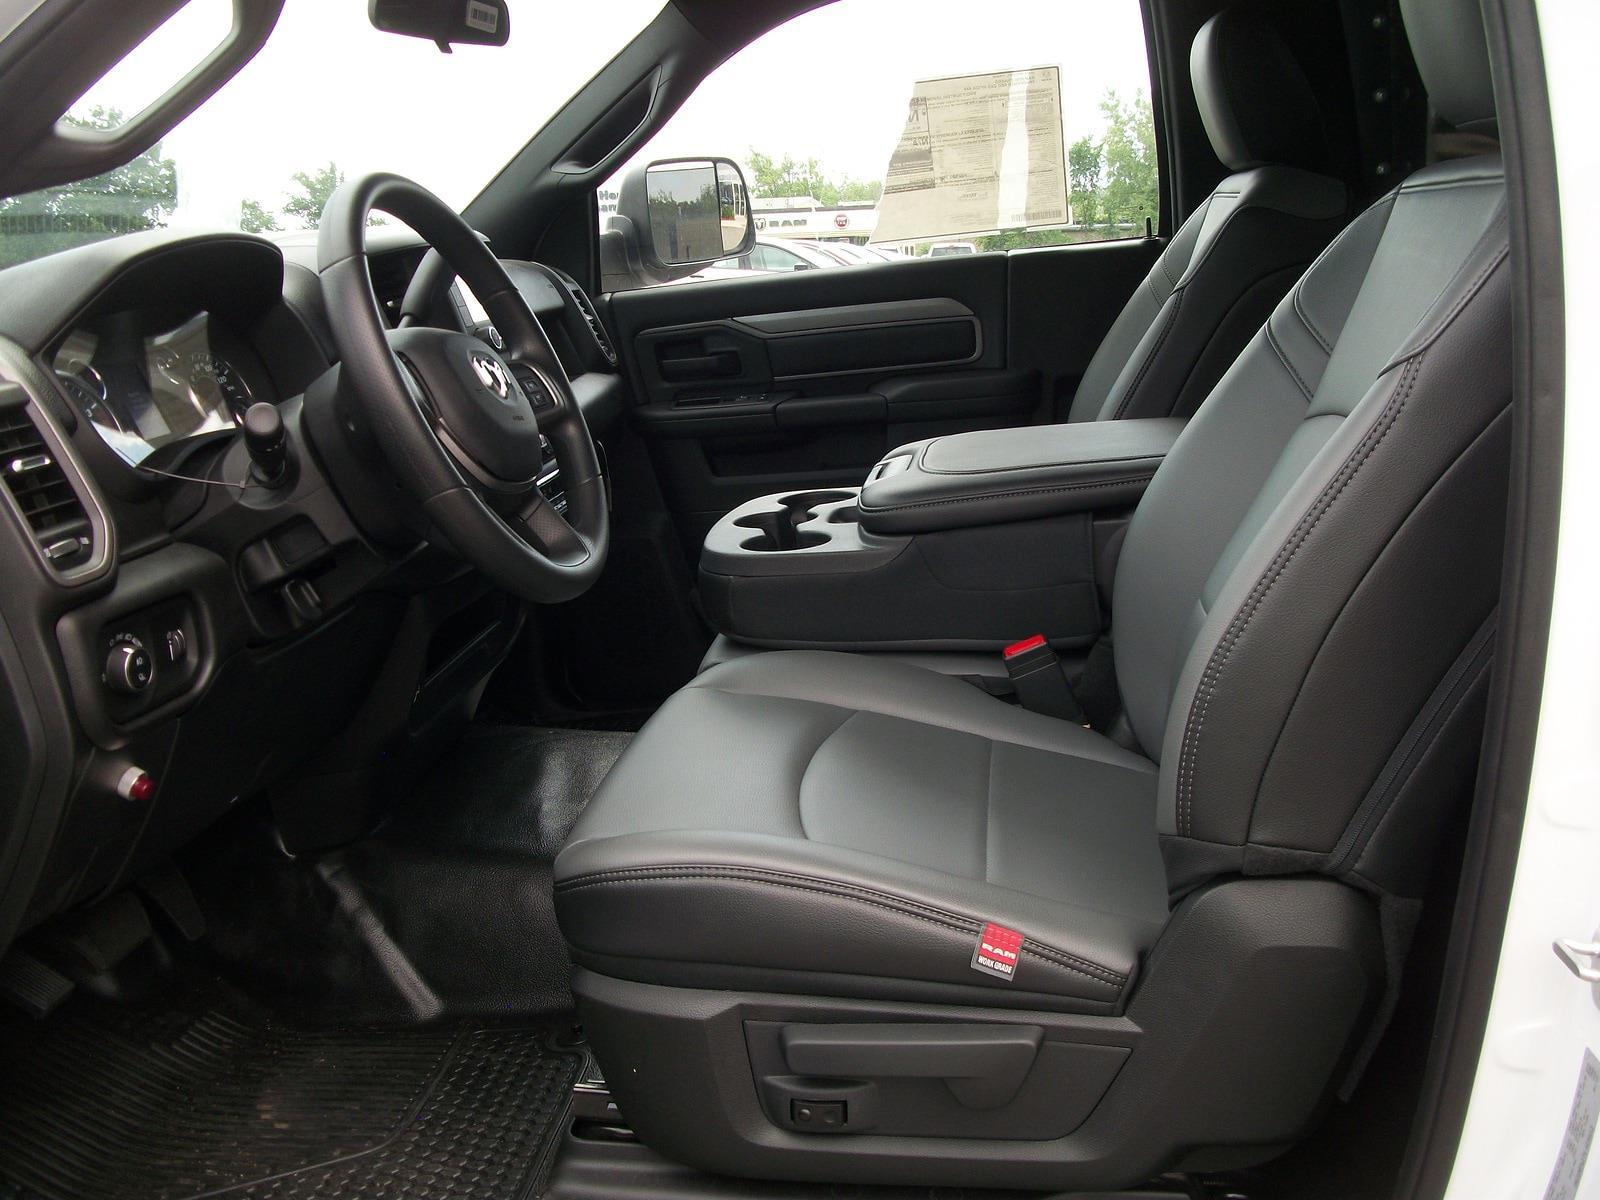 2021 Ram 5500 Regular Cab DRW 4x4,  Cab Chassis #21307 - photo 10